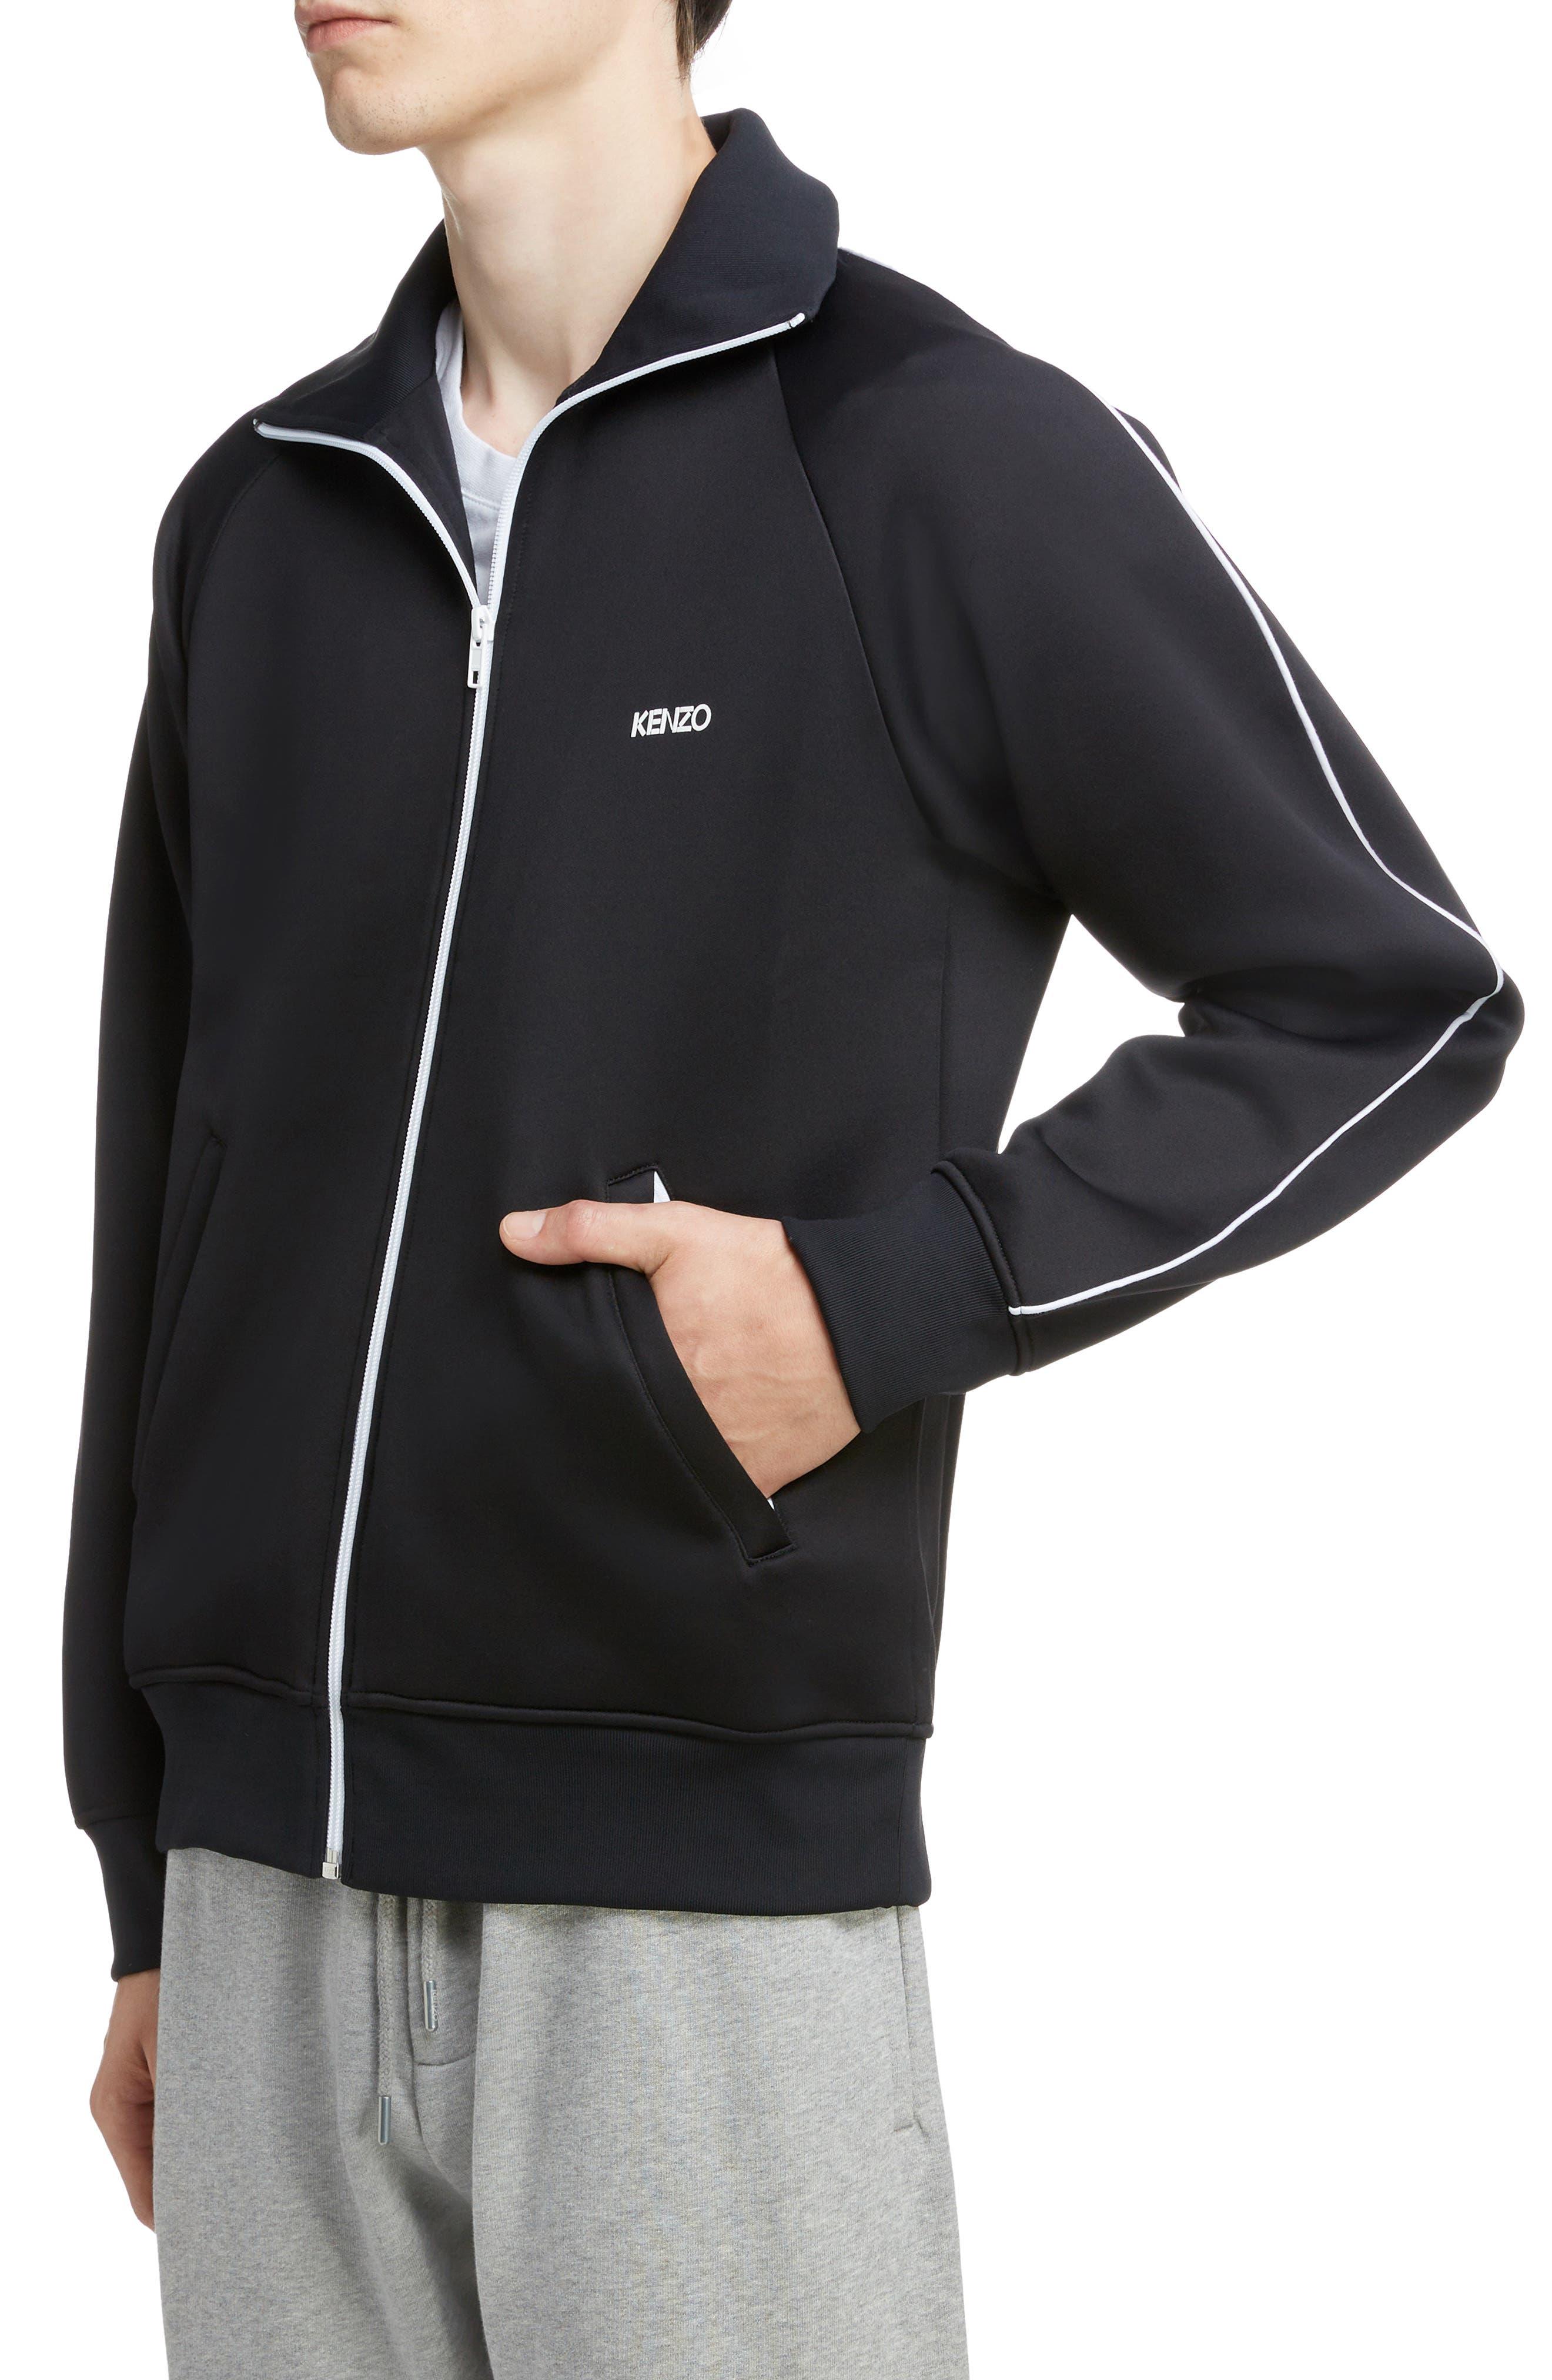 KENZO, Zip Track Jacket, Alternate thumbnail 4, color, BLACK